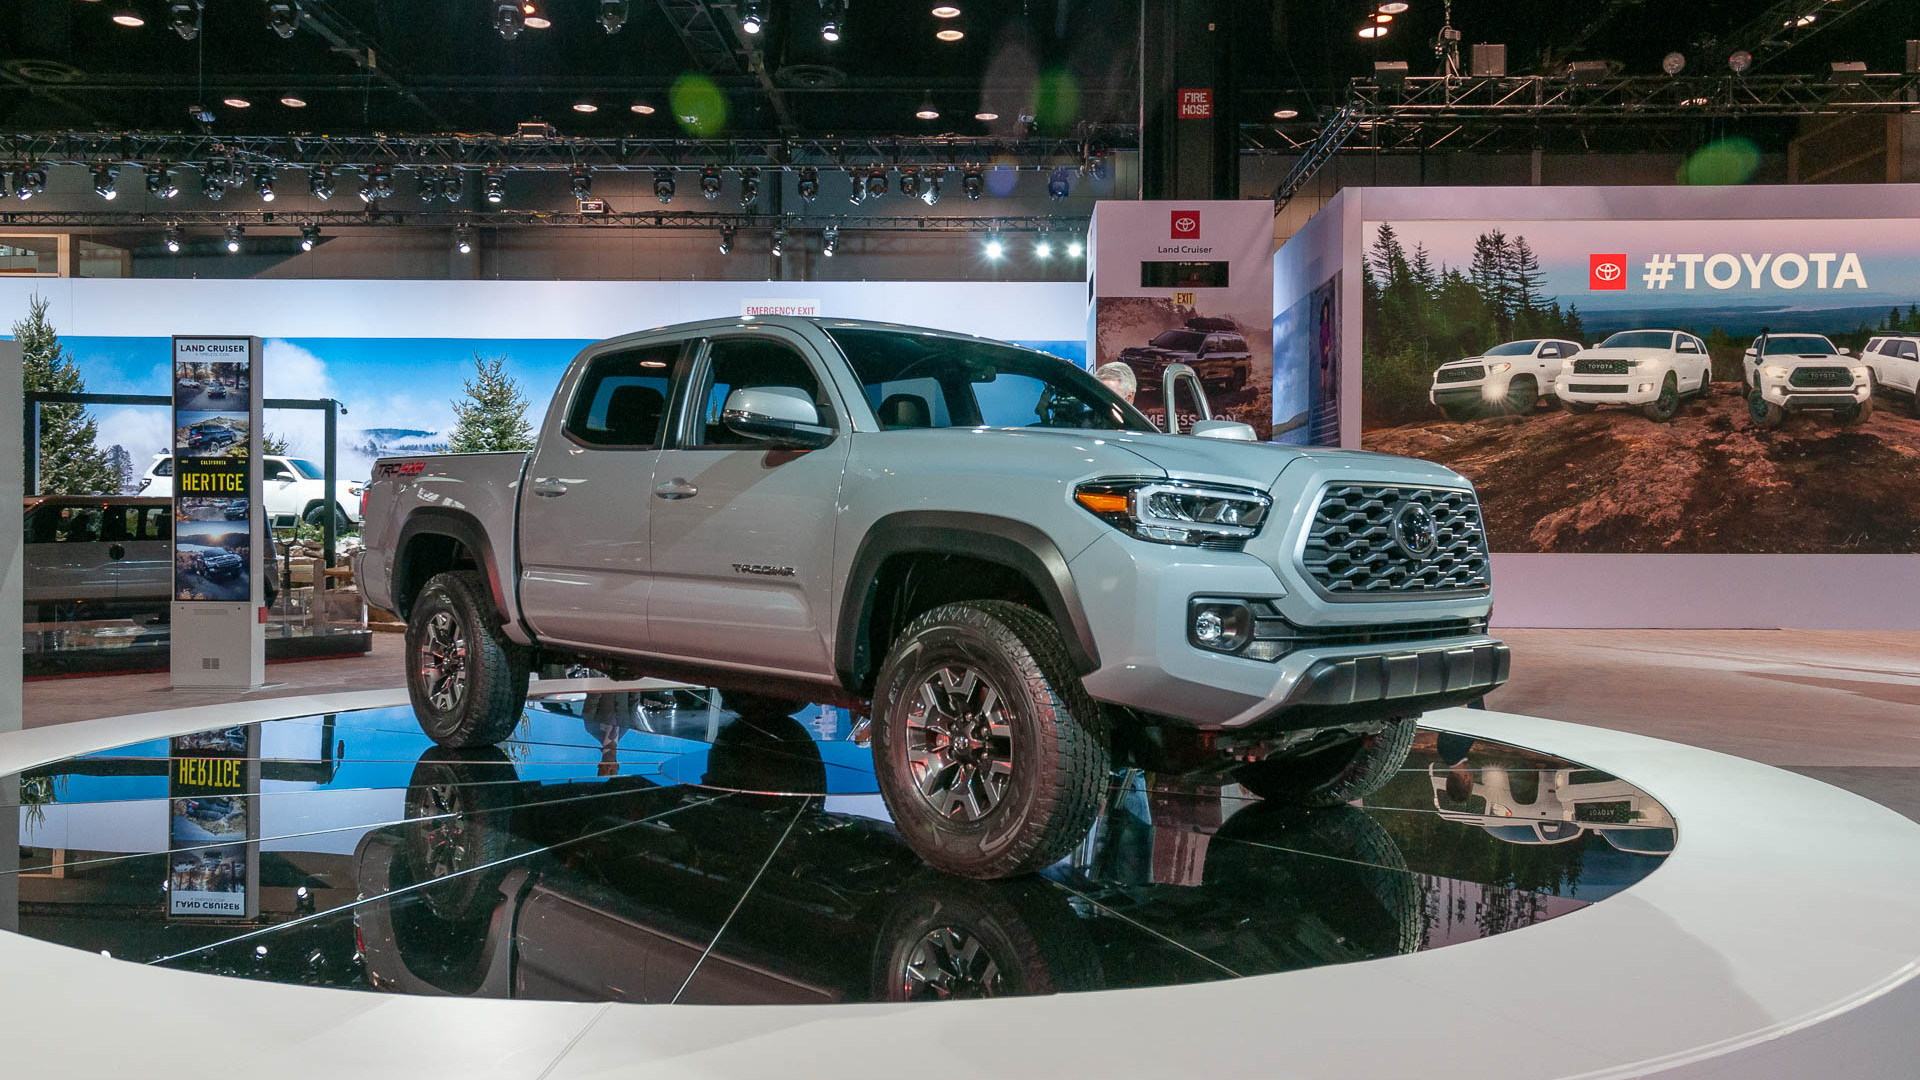 2020 Toyota Tacoma, 2019 Chicago Auto Show